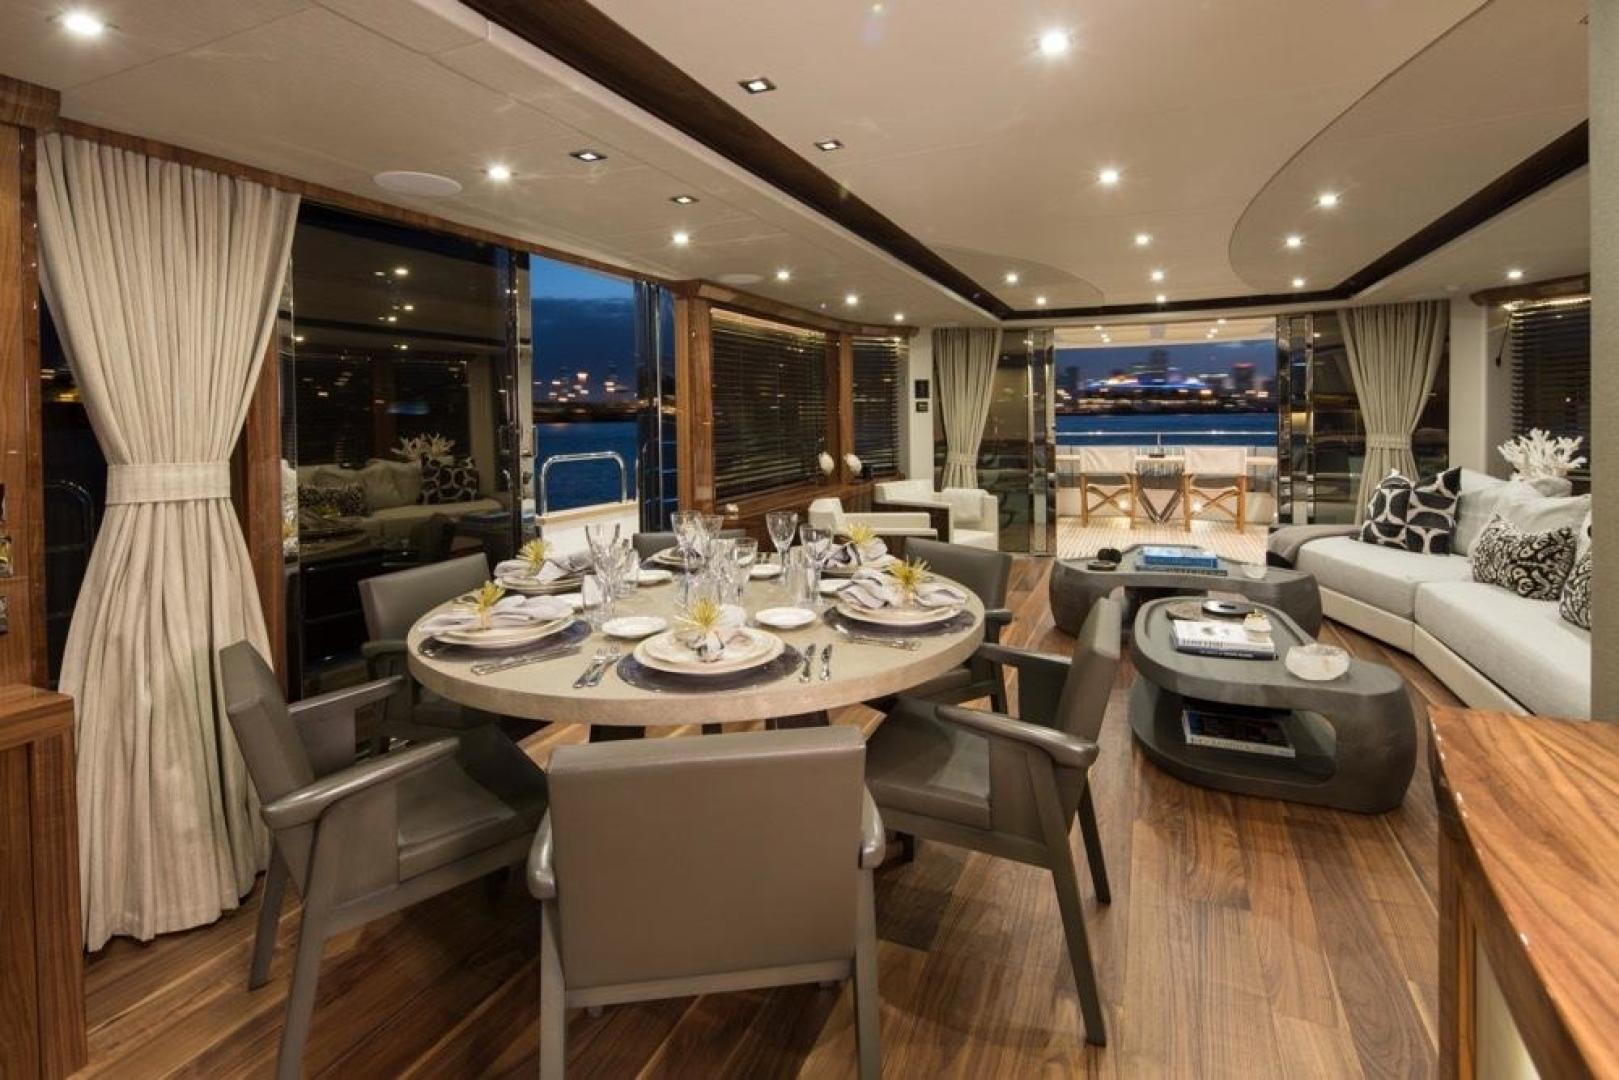 Sunseeker-28 Metre Yacht 2016-RIII Miami-Florida-United States-2016 SUNSEEKER 92 RIII FOR SALE-600099 | Thumbnail